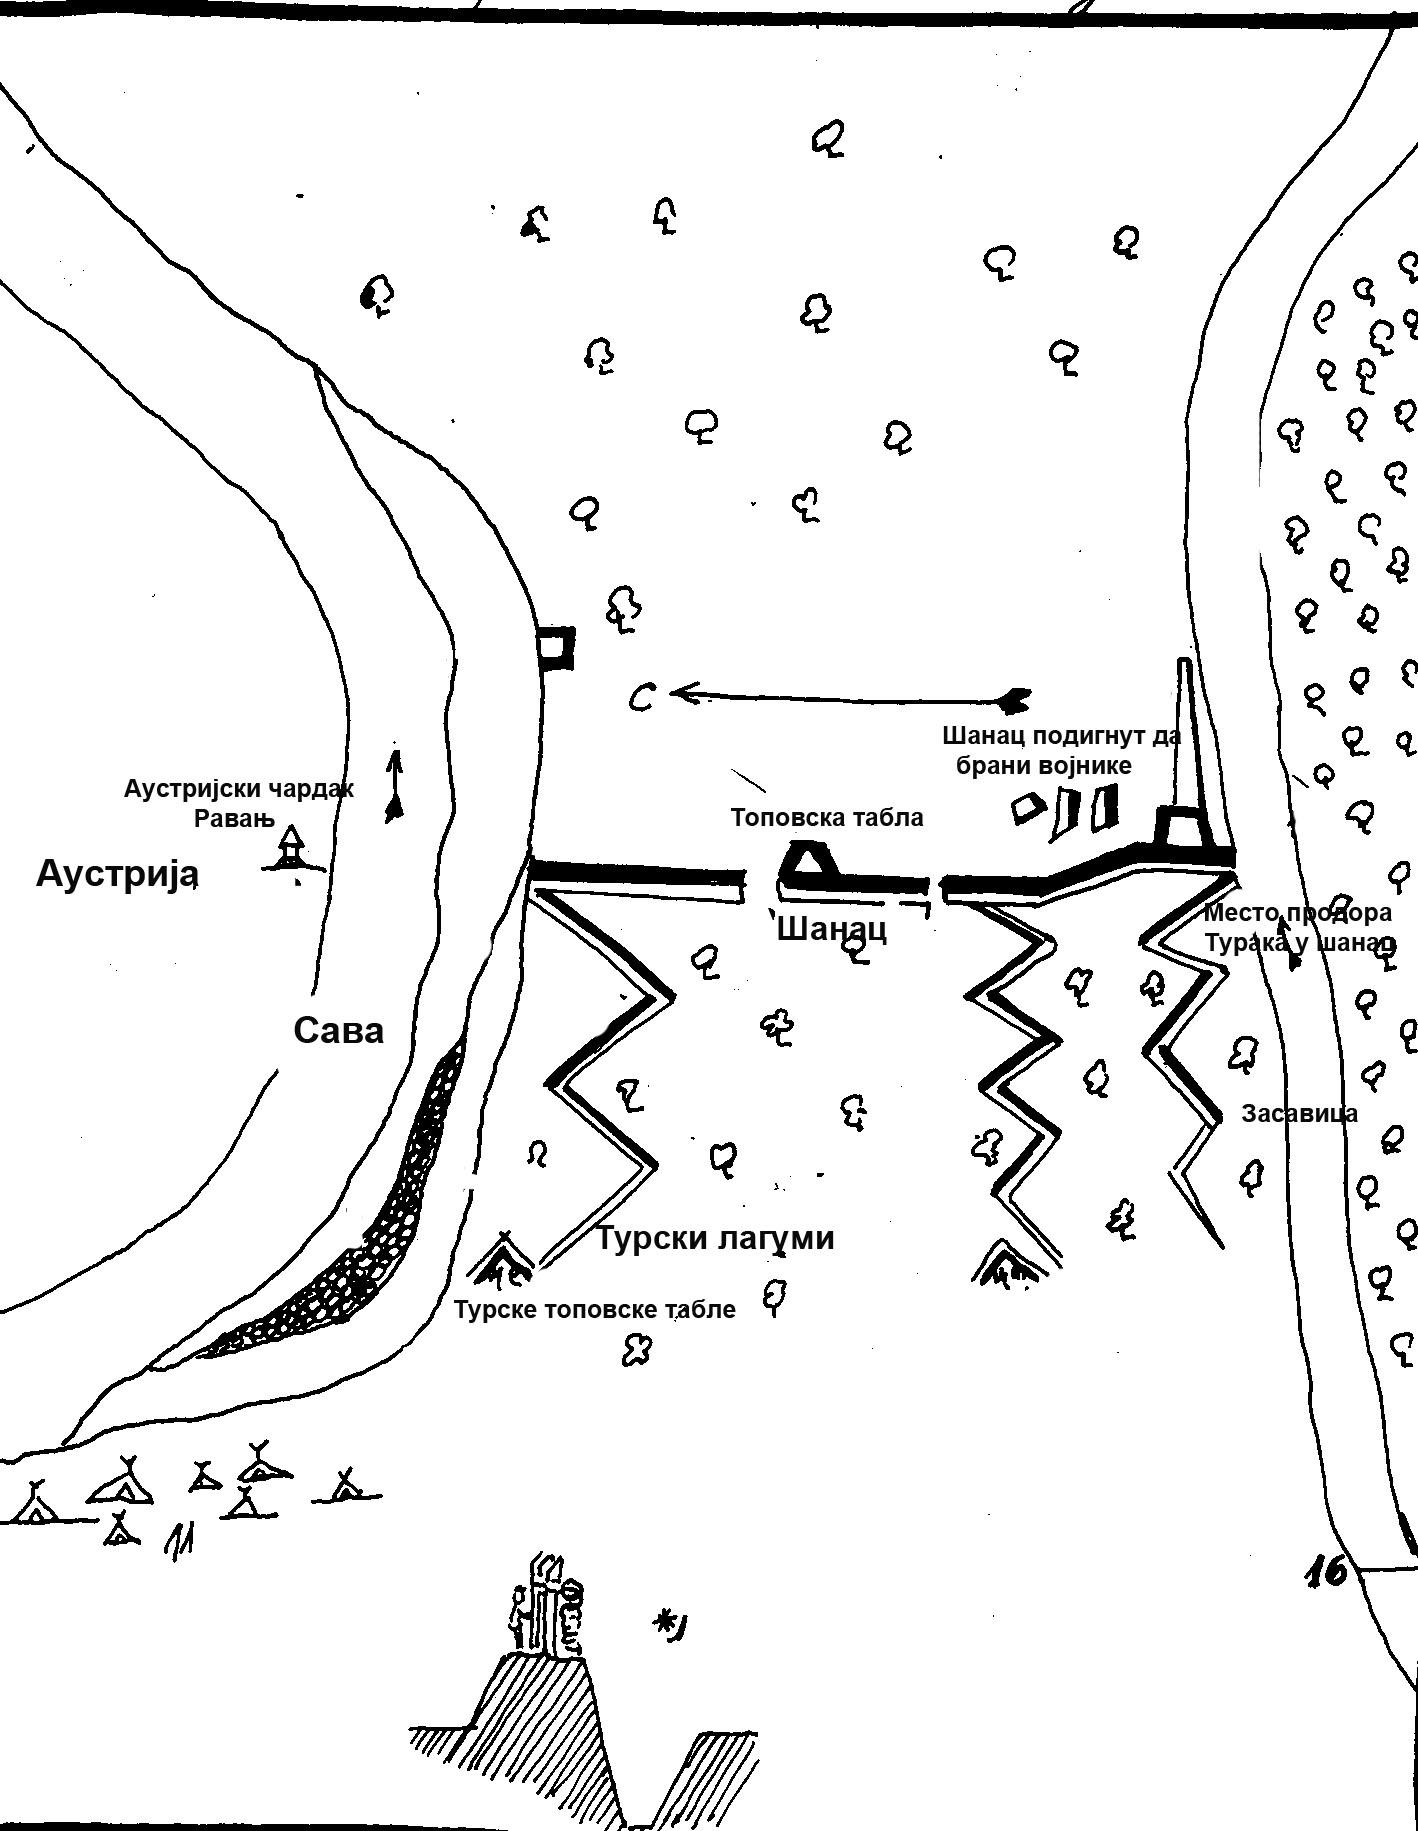 Јатаган, топуз, сабља Battle_of_Ravanj_map